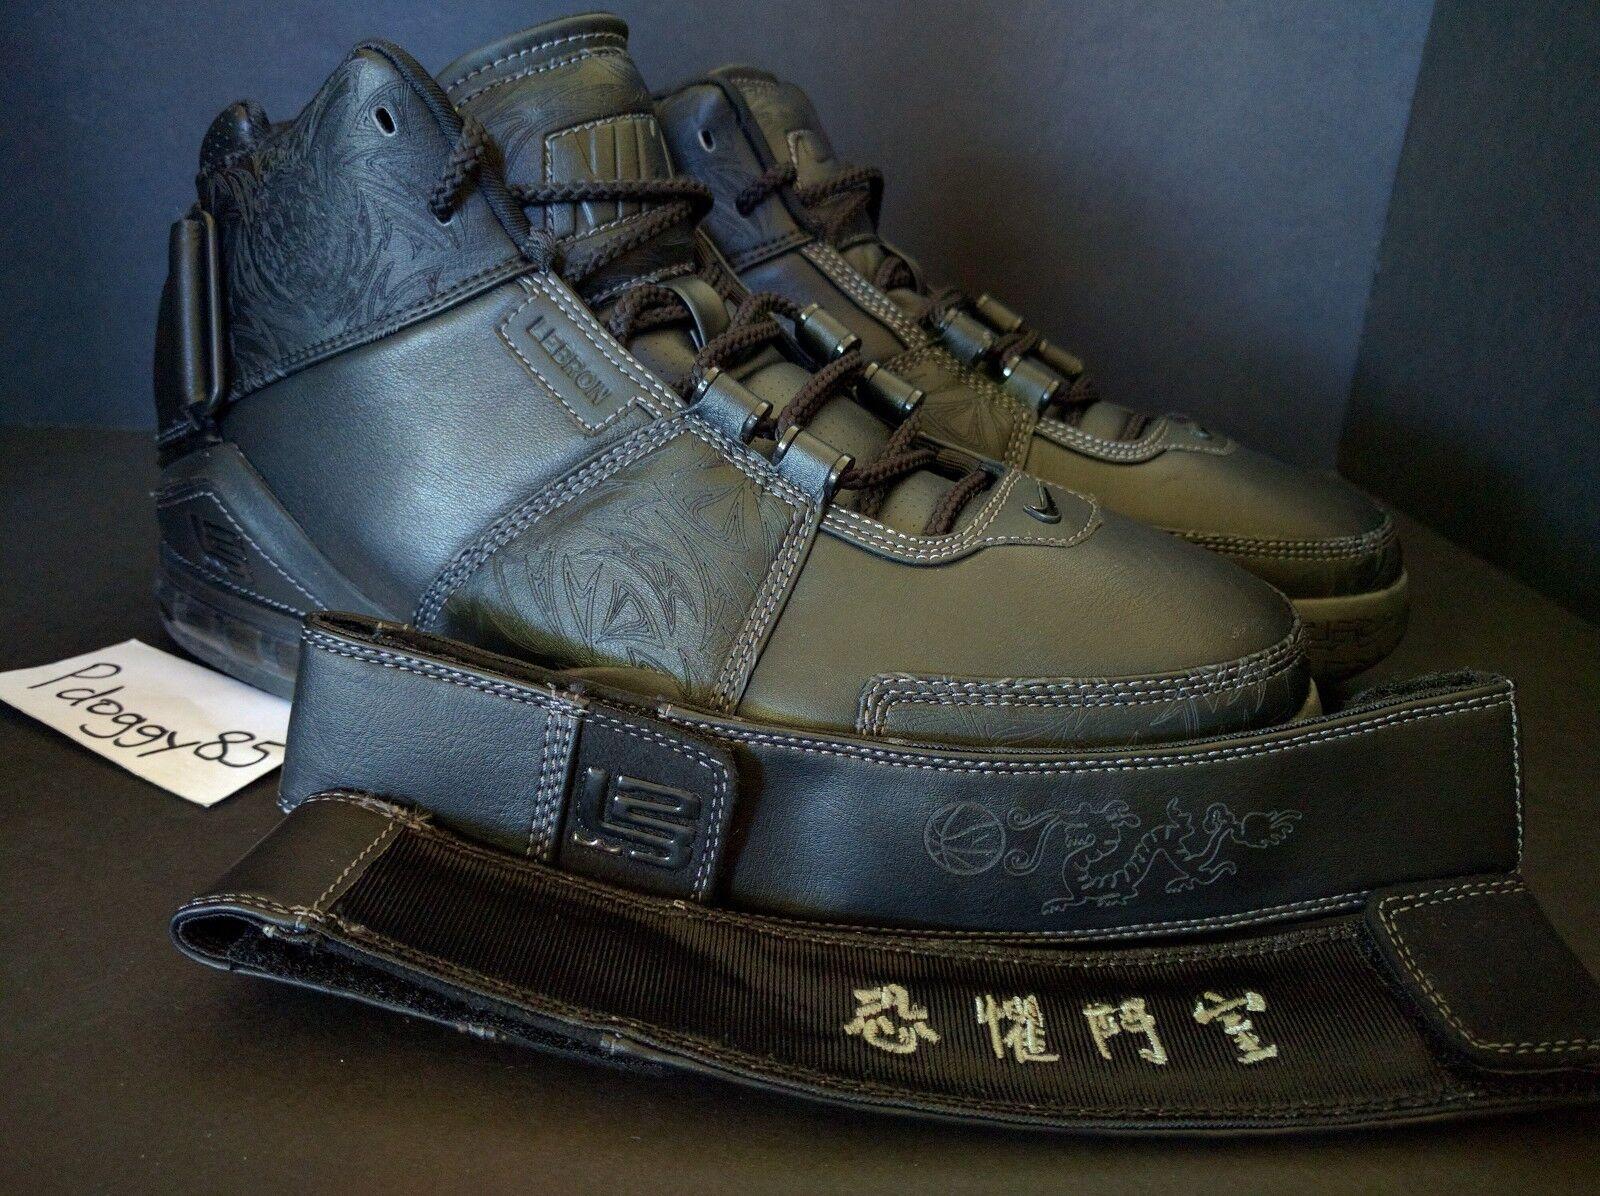 Sample Chamber of Fear Nike Air Zoom Lebron II 2 DS sz 10 Birthday Bday COF Bang